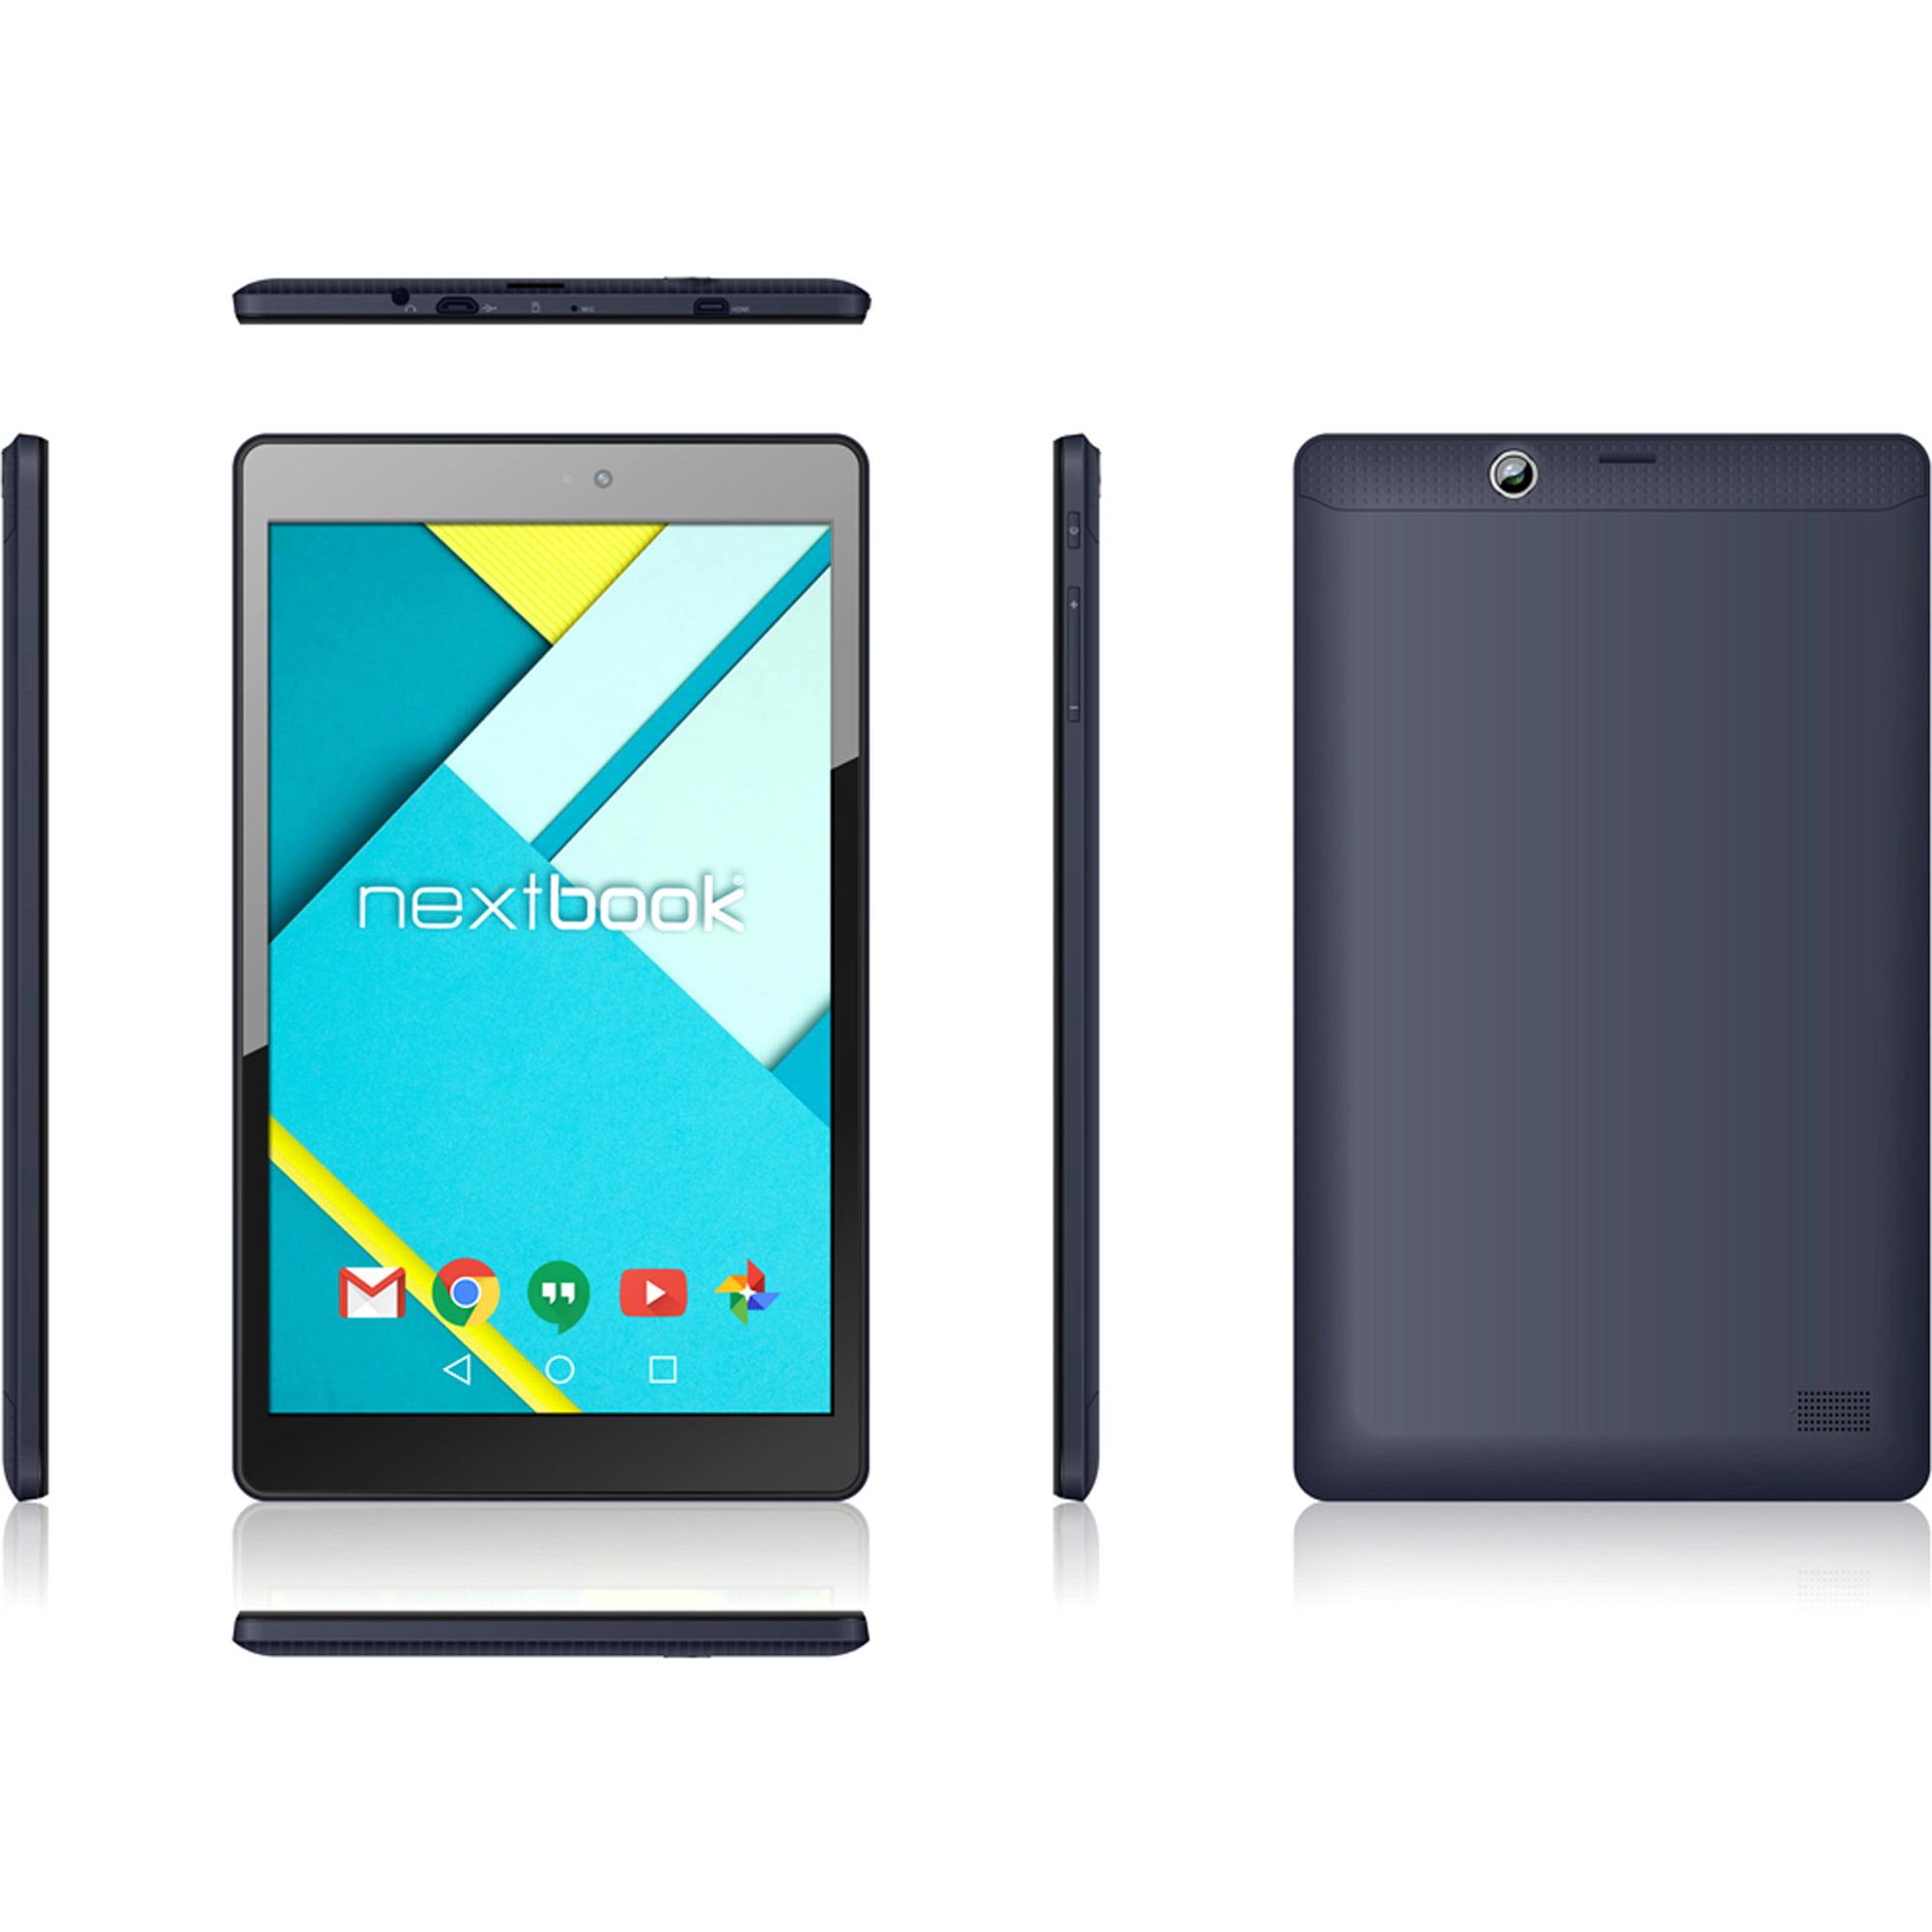 "Nextbook Ares 8"" Tablet 16GB Intel Atom Z3735G Quad-Core ..."